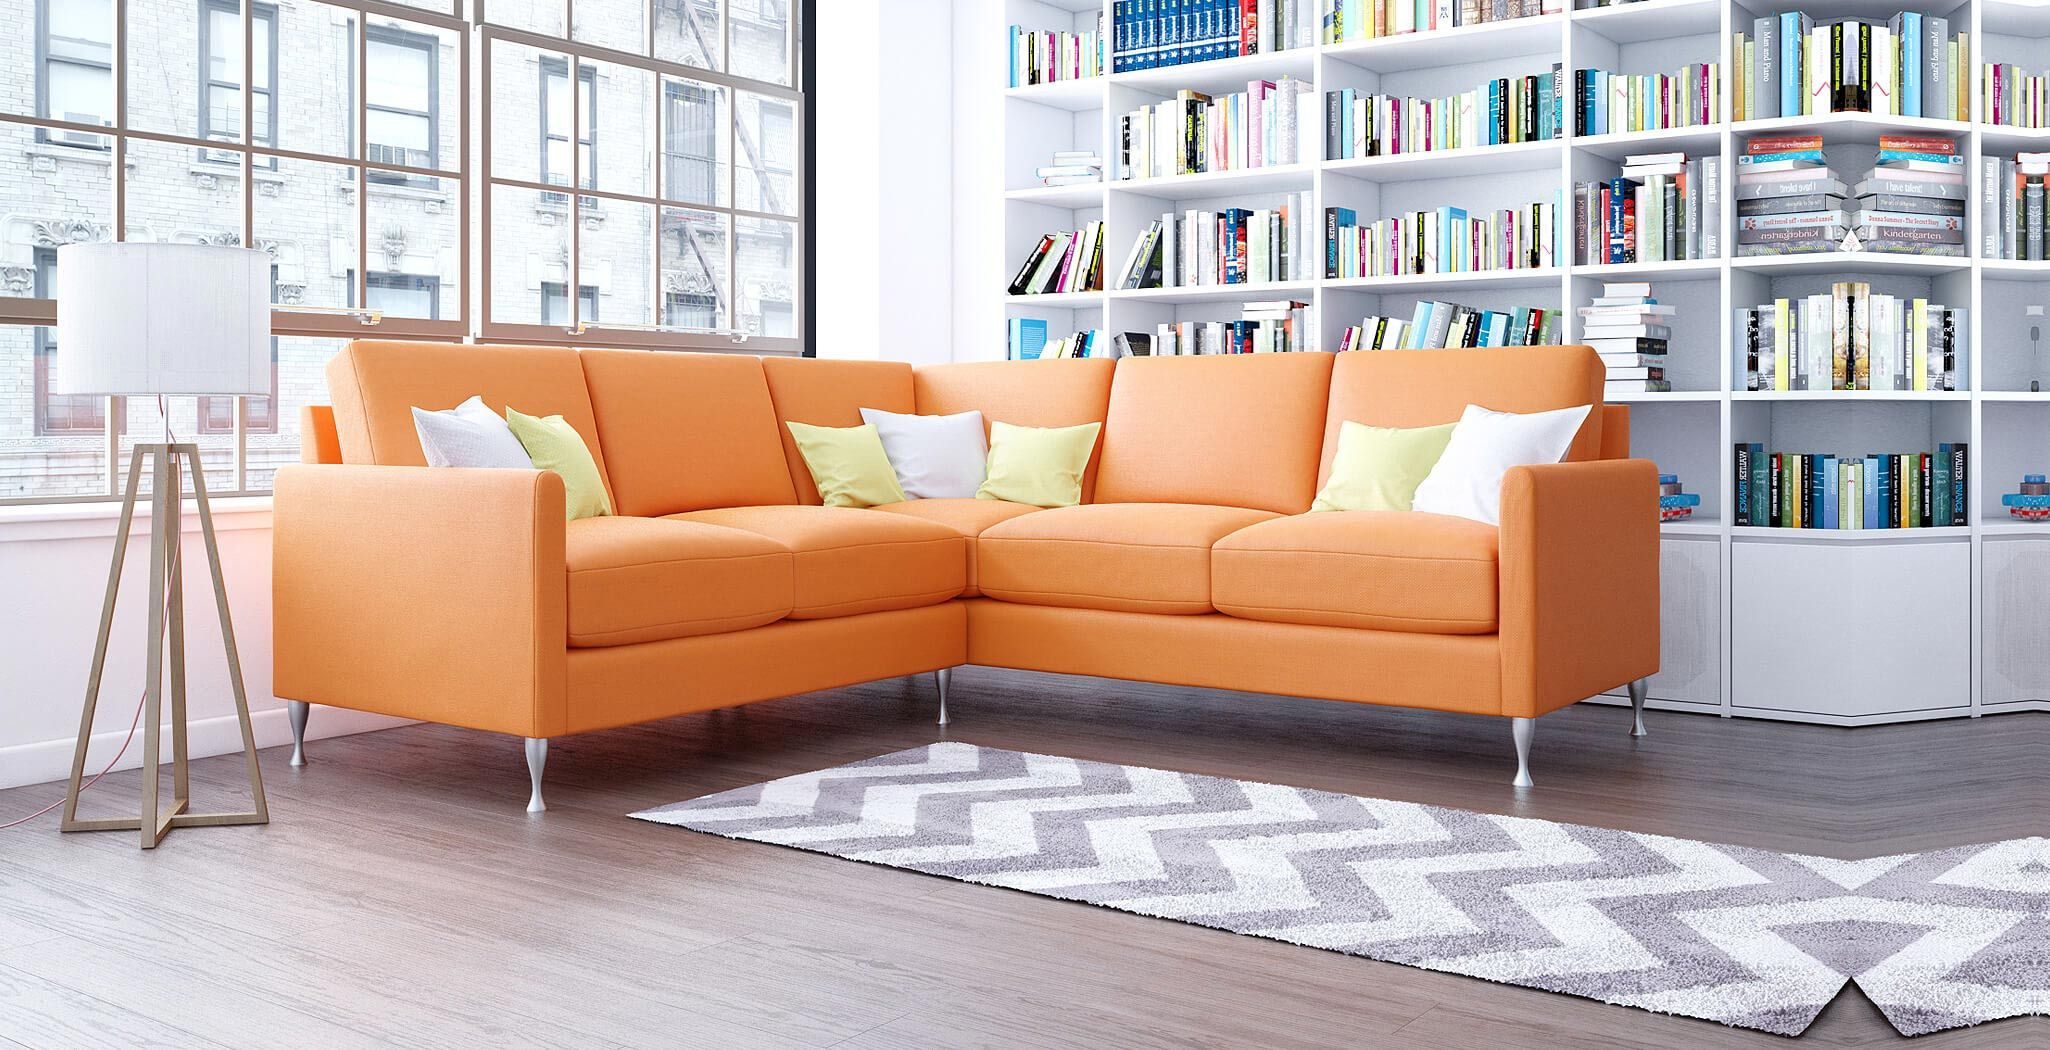 eureka sectional furniture gallery 1